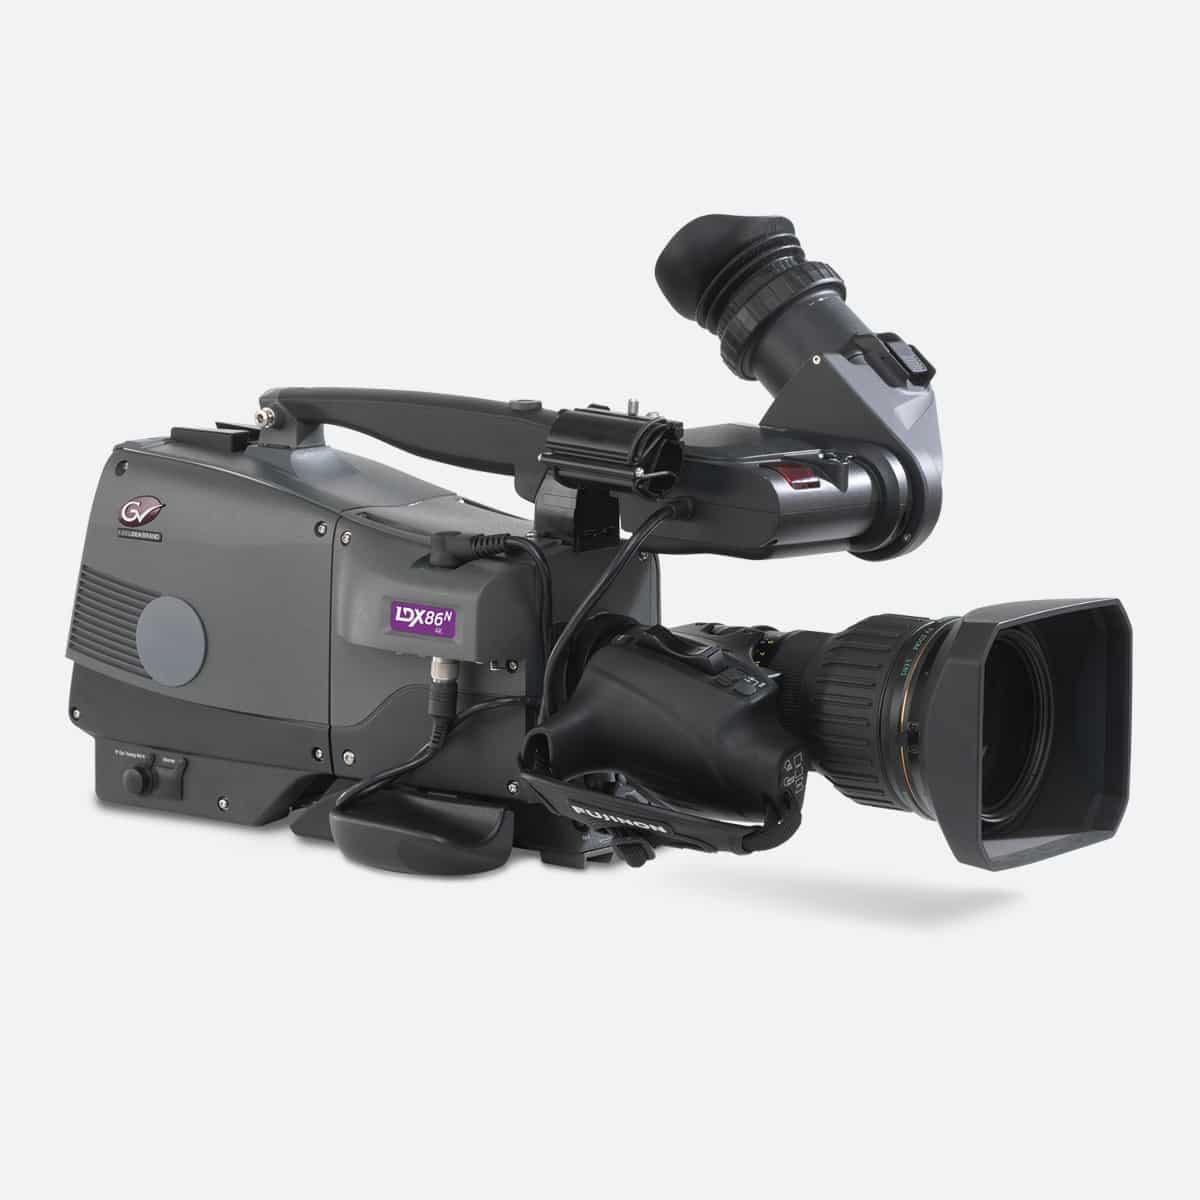 Grass Valley LDX 86N WorldCam 4K Camera System